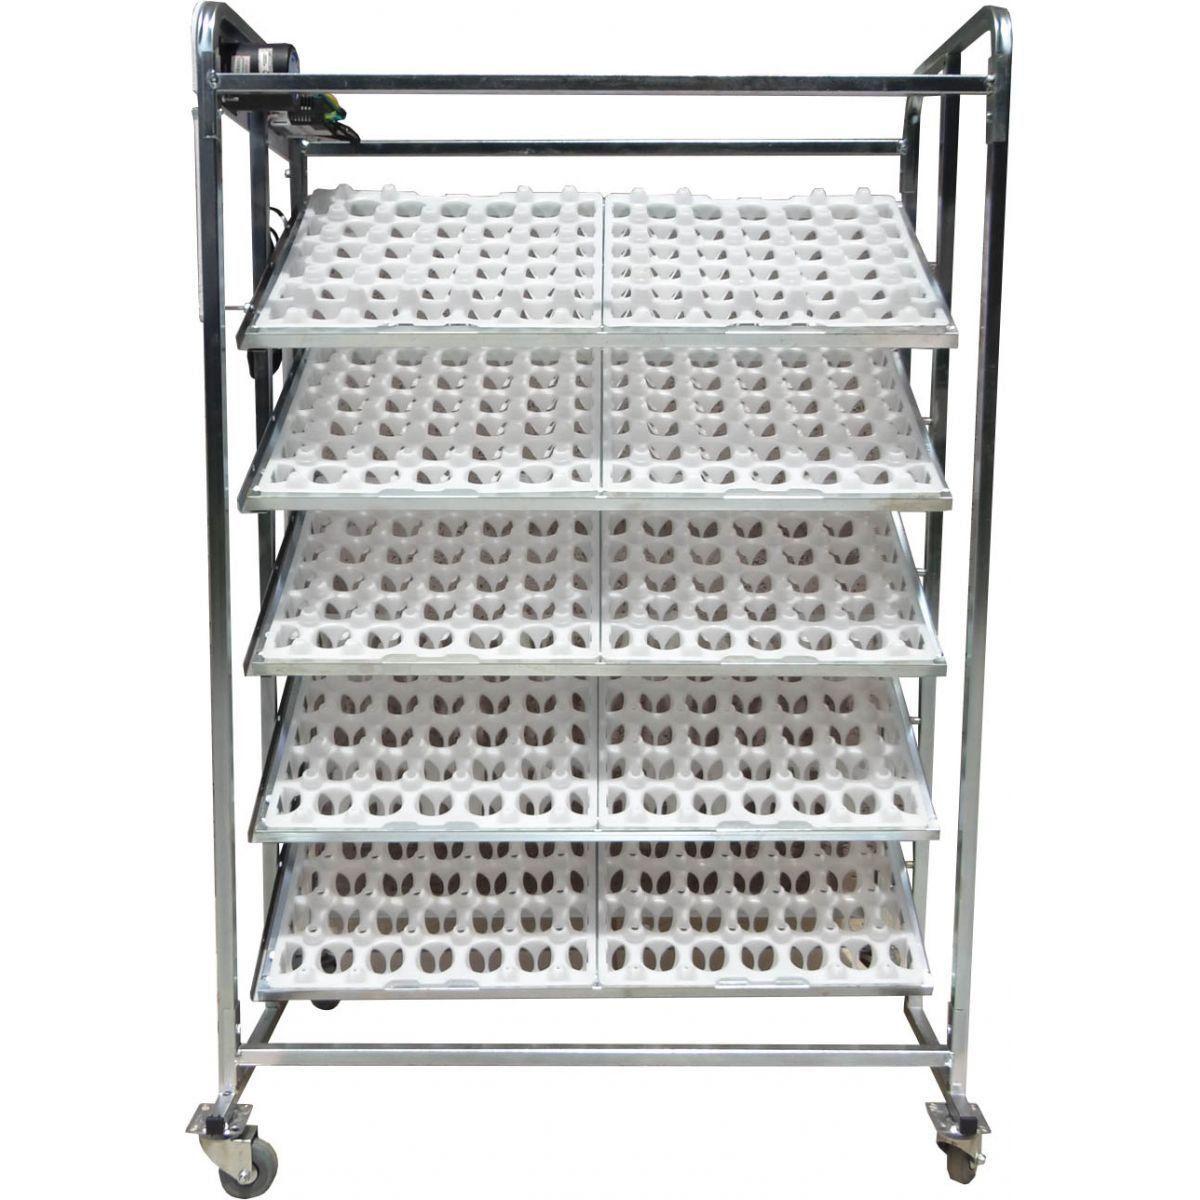 Girador de ovos - Automático